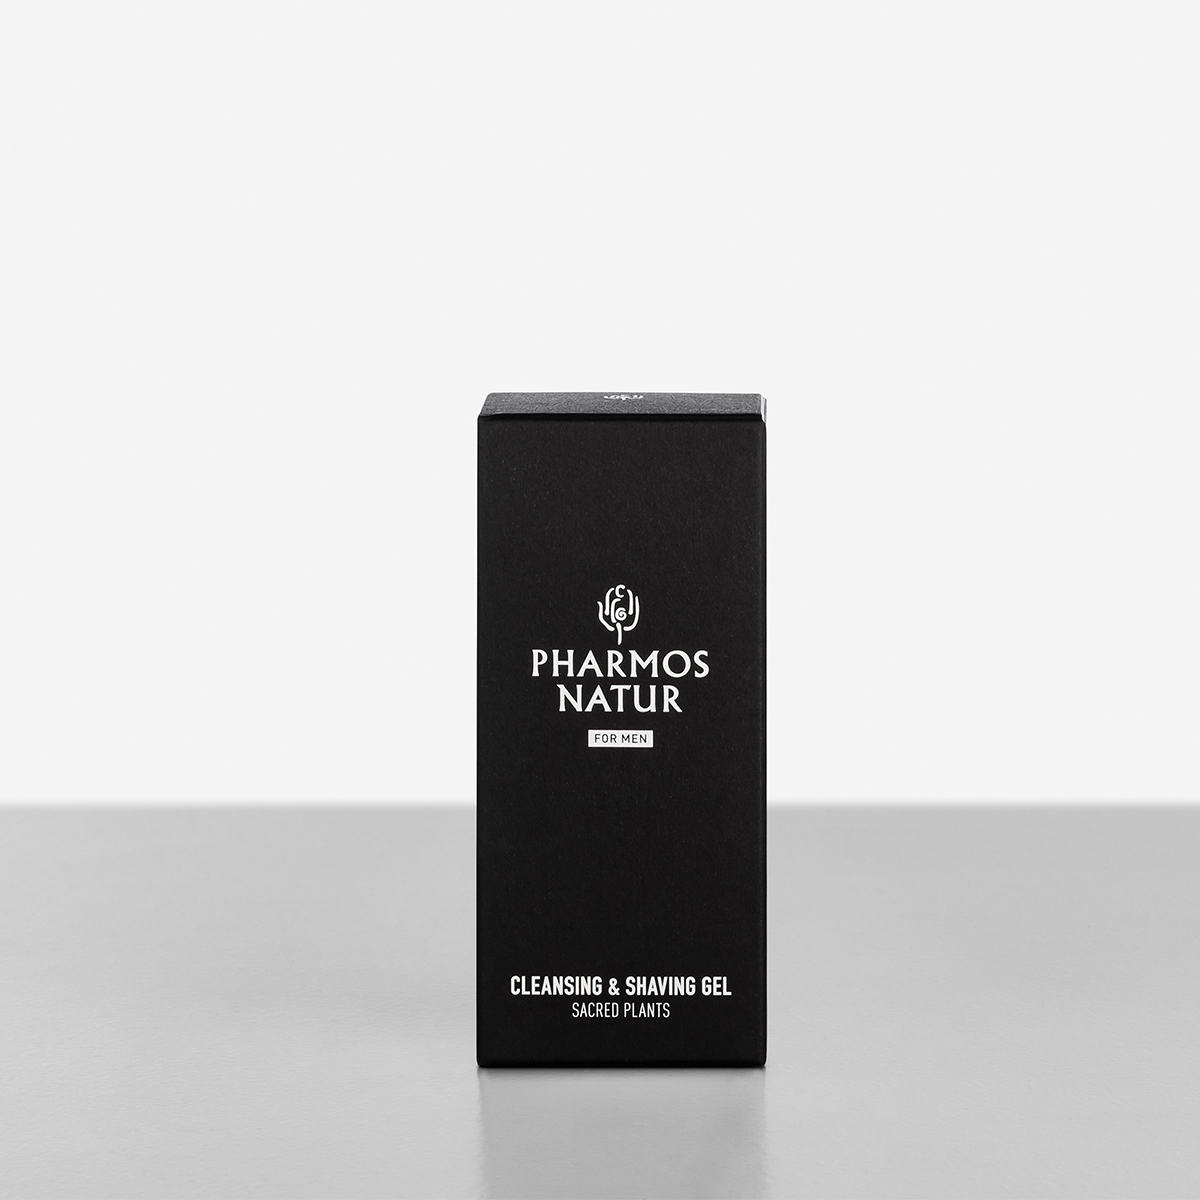 Verpackung Cleansing and Shaving Gel Produktbild